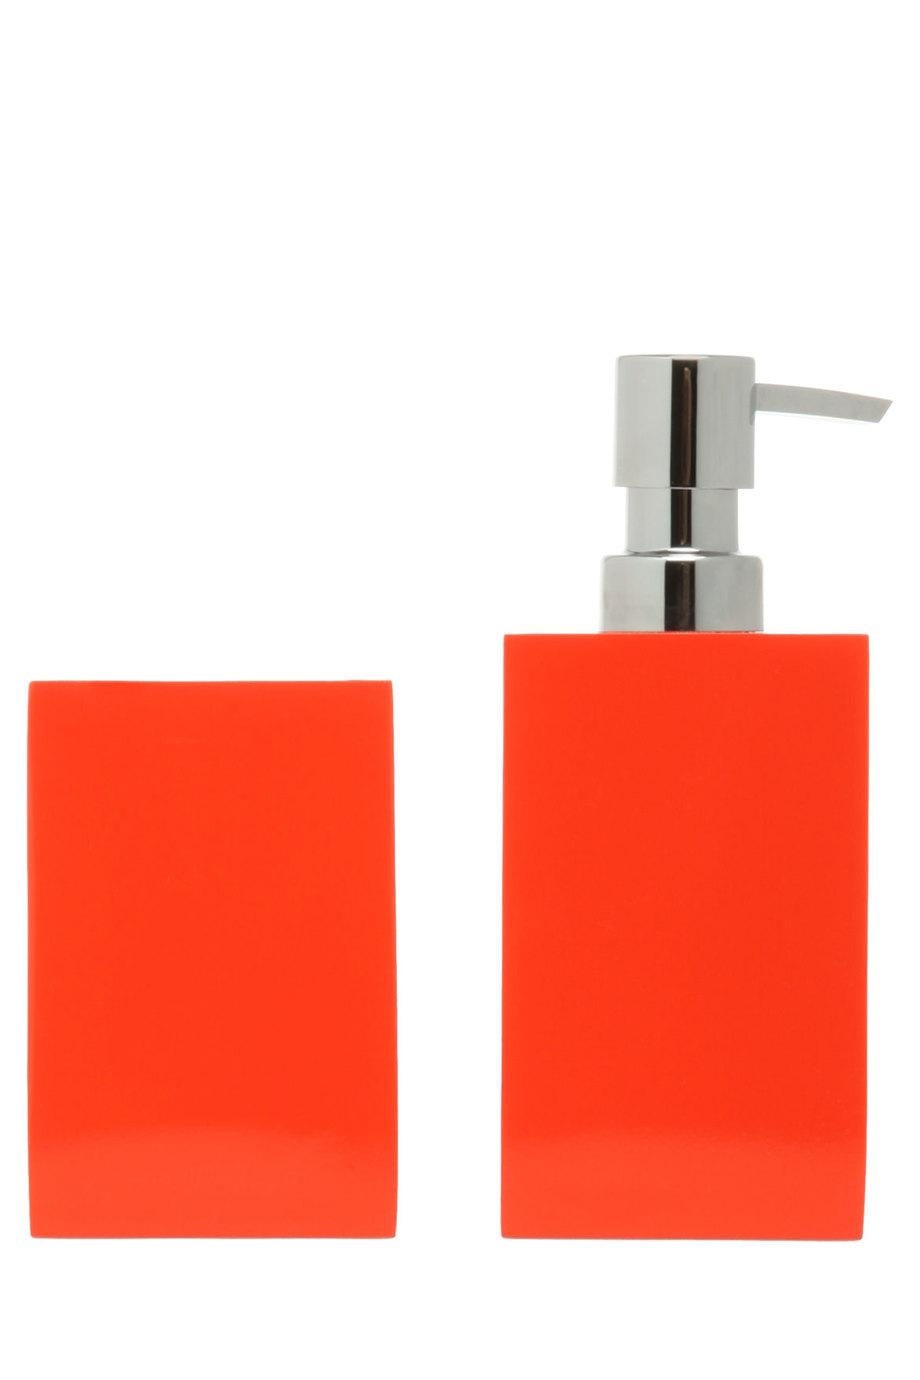 Myer bathroom accessories - Myer